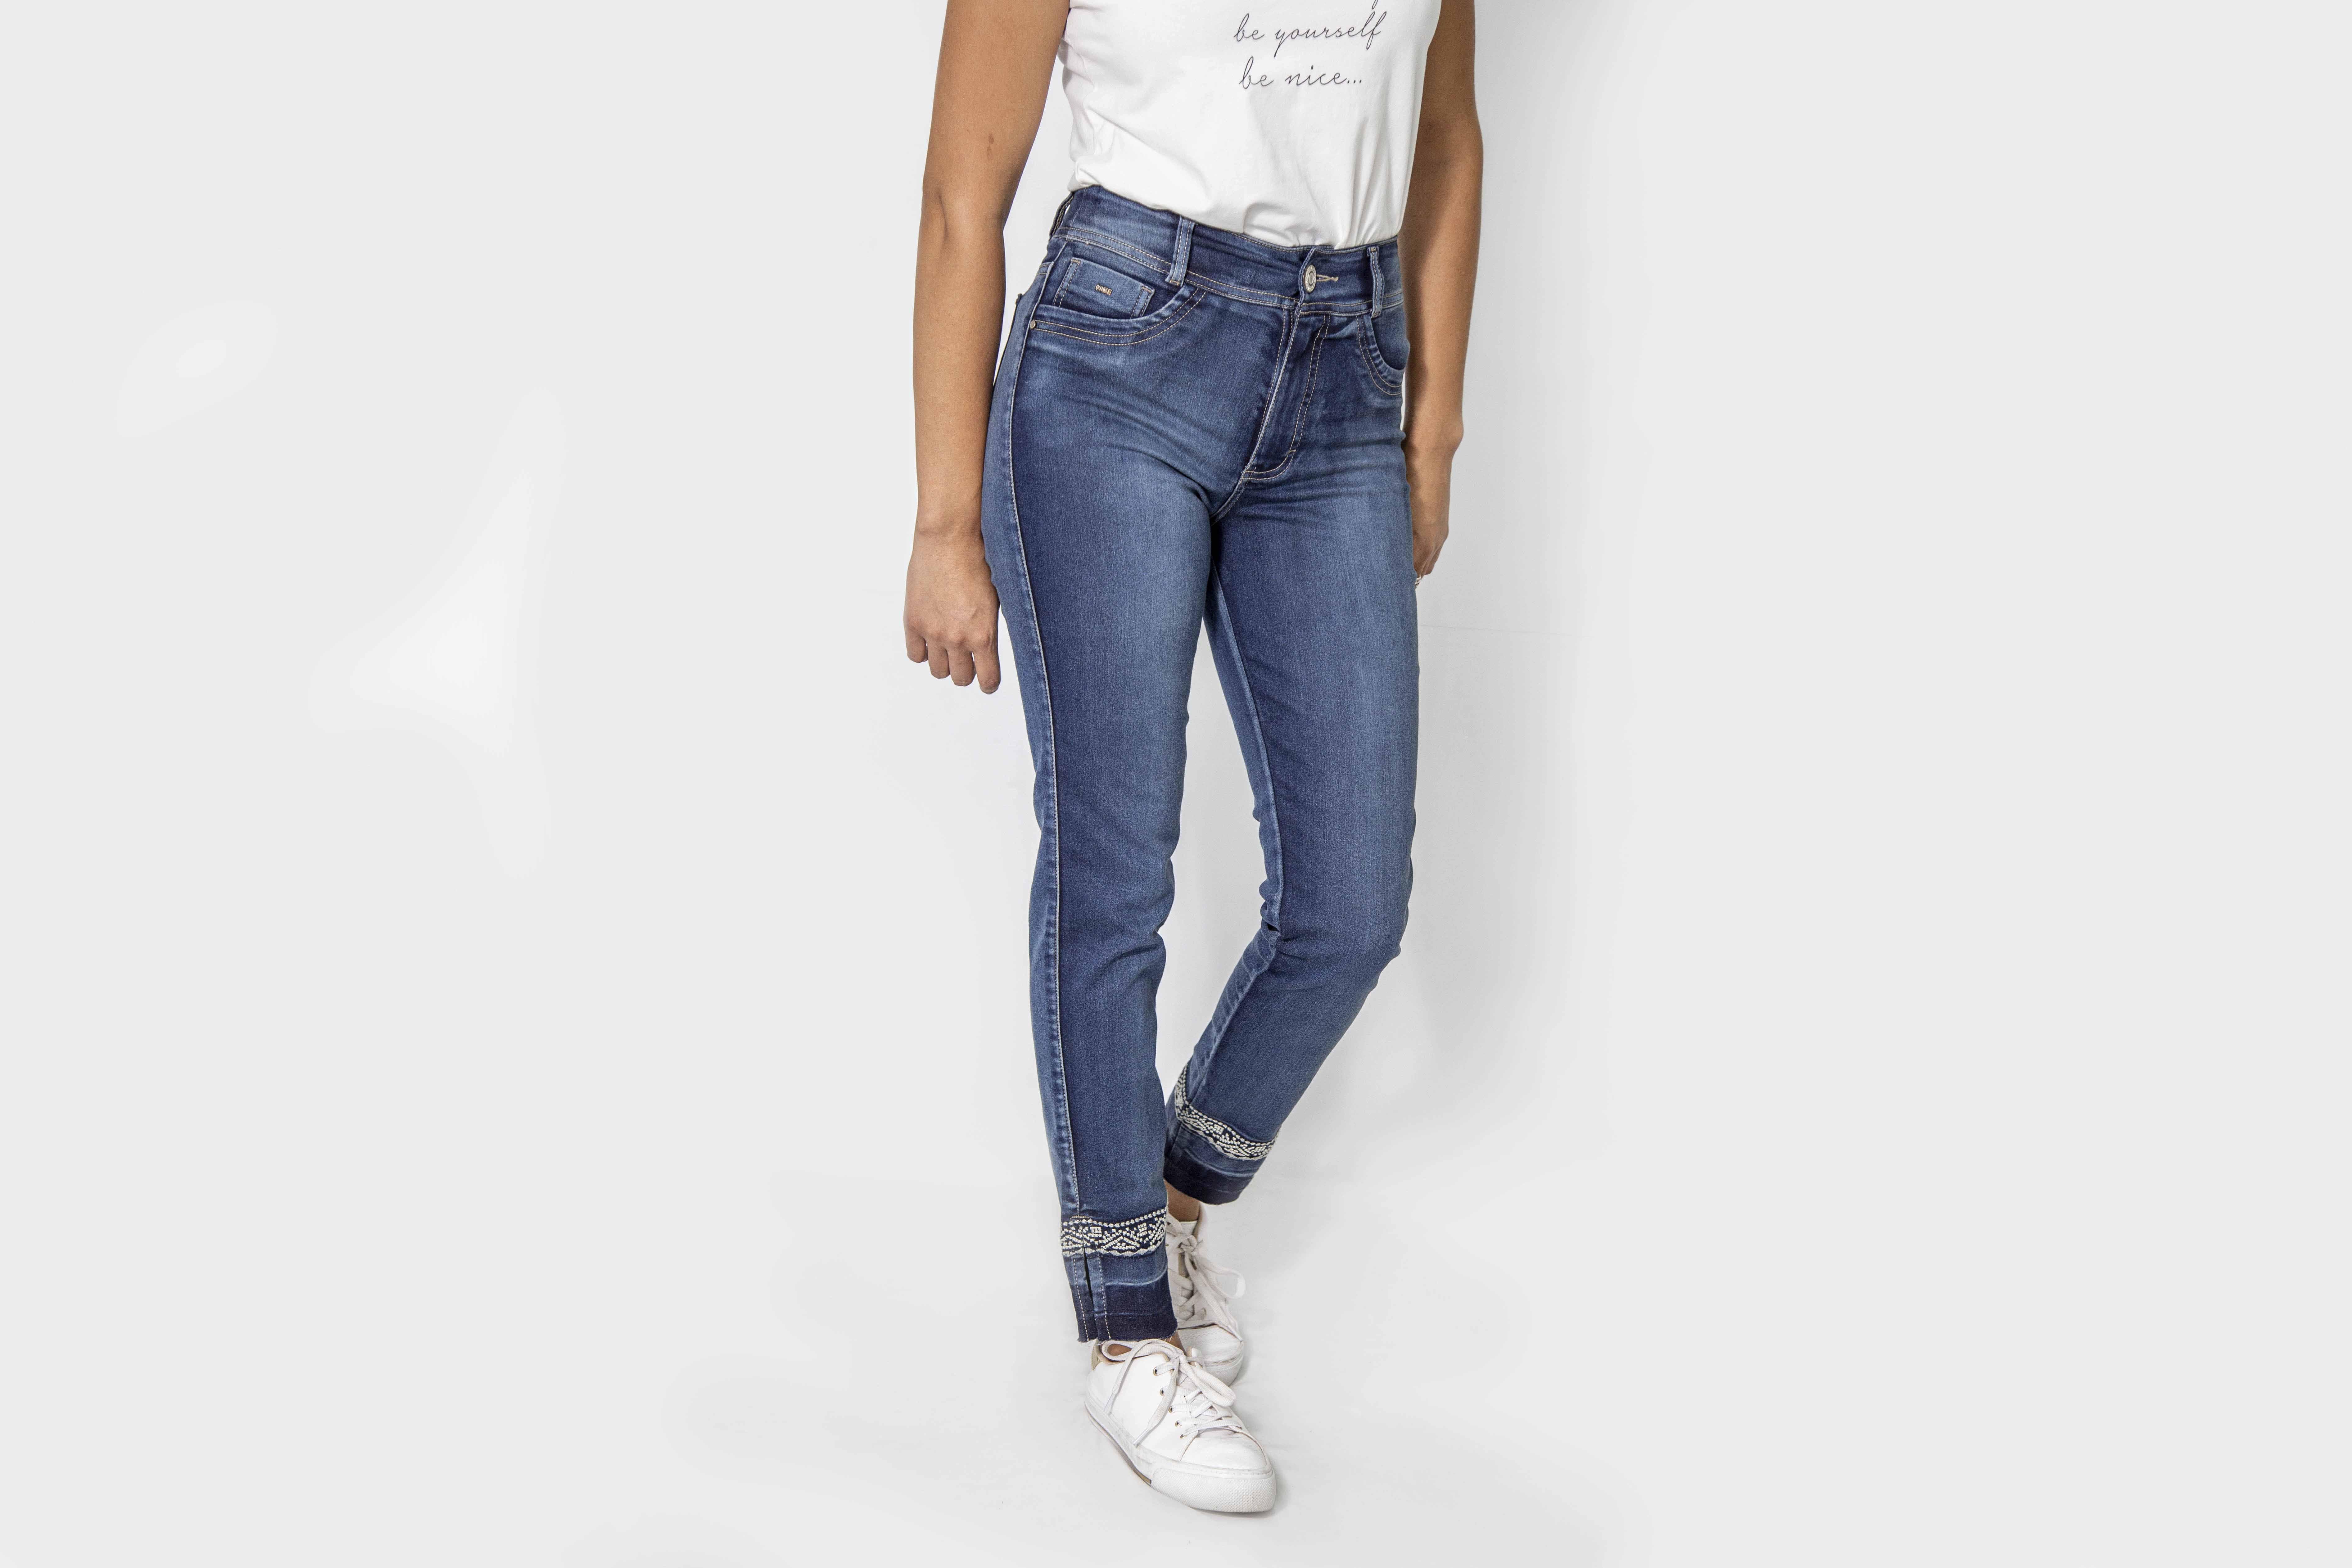 Corton Dama Jeans Elast. Cod. 1190316